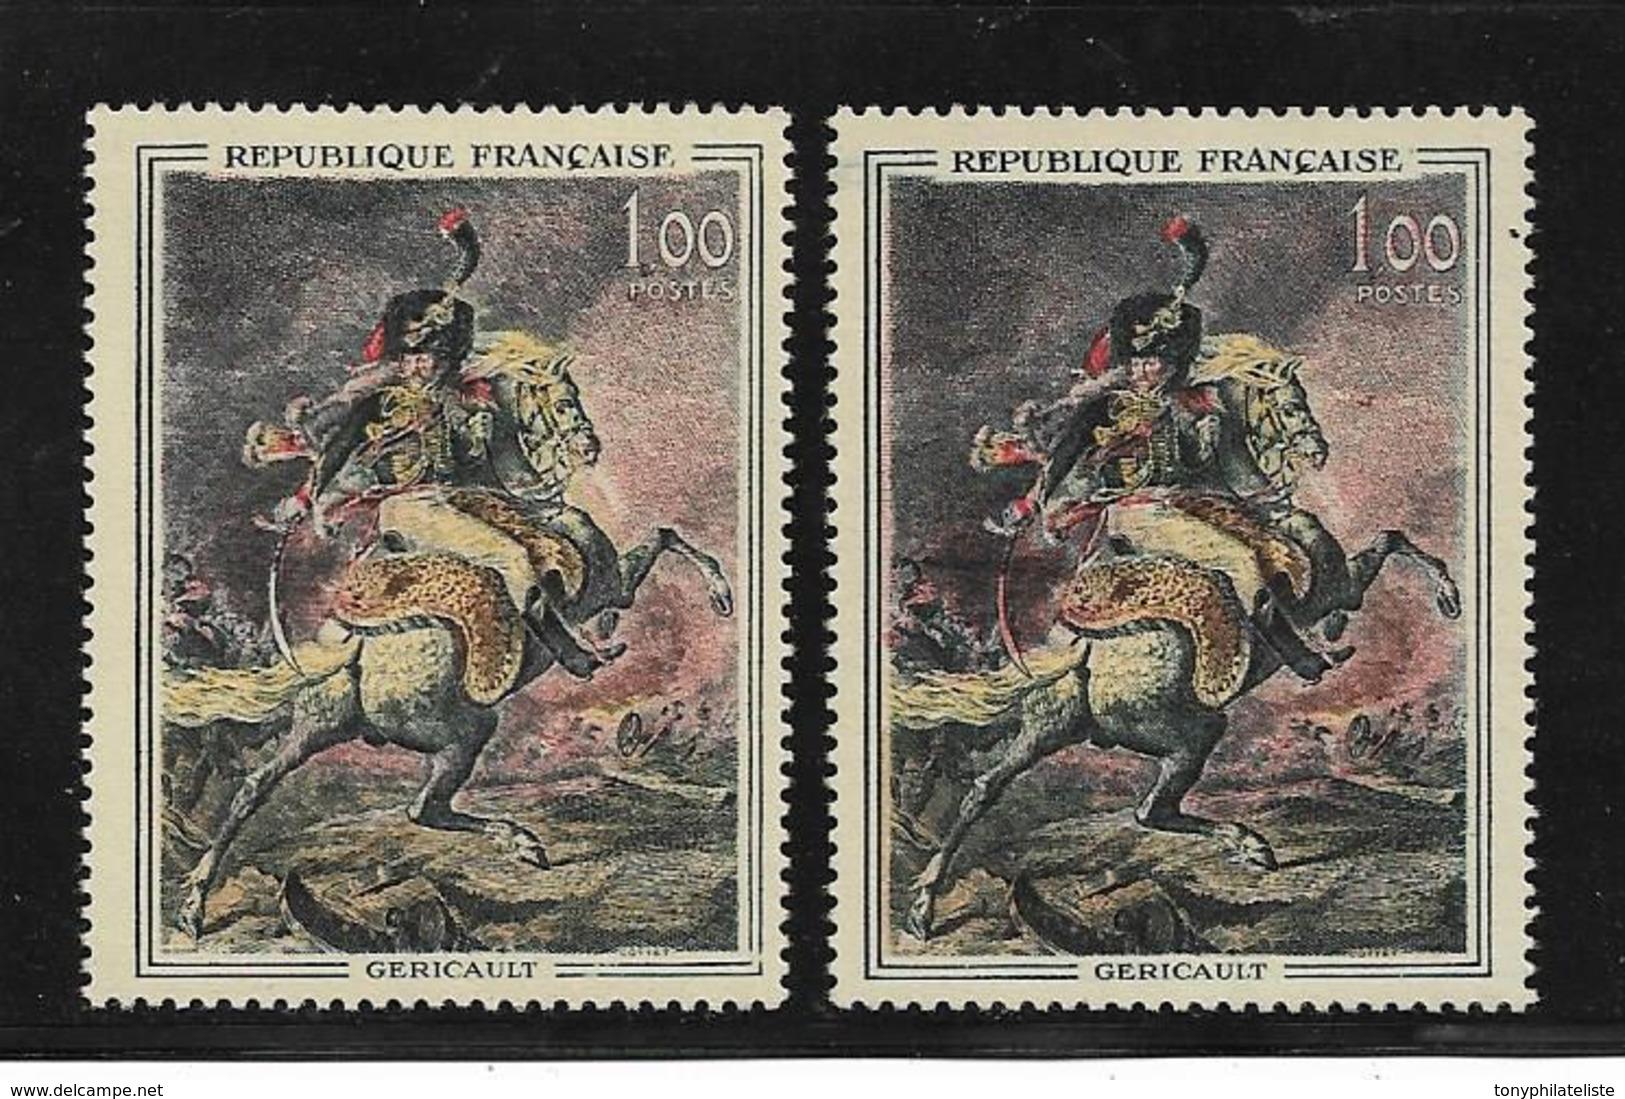 France N°1365 Et 1365a (sabre Rouge) Neuf ** - Variedades Y Curiosidades